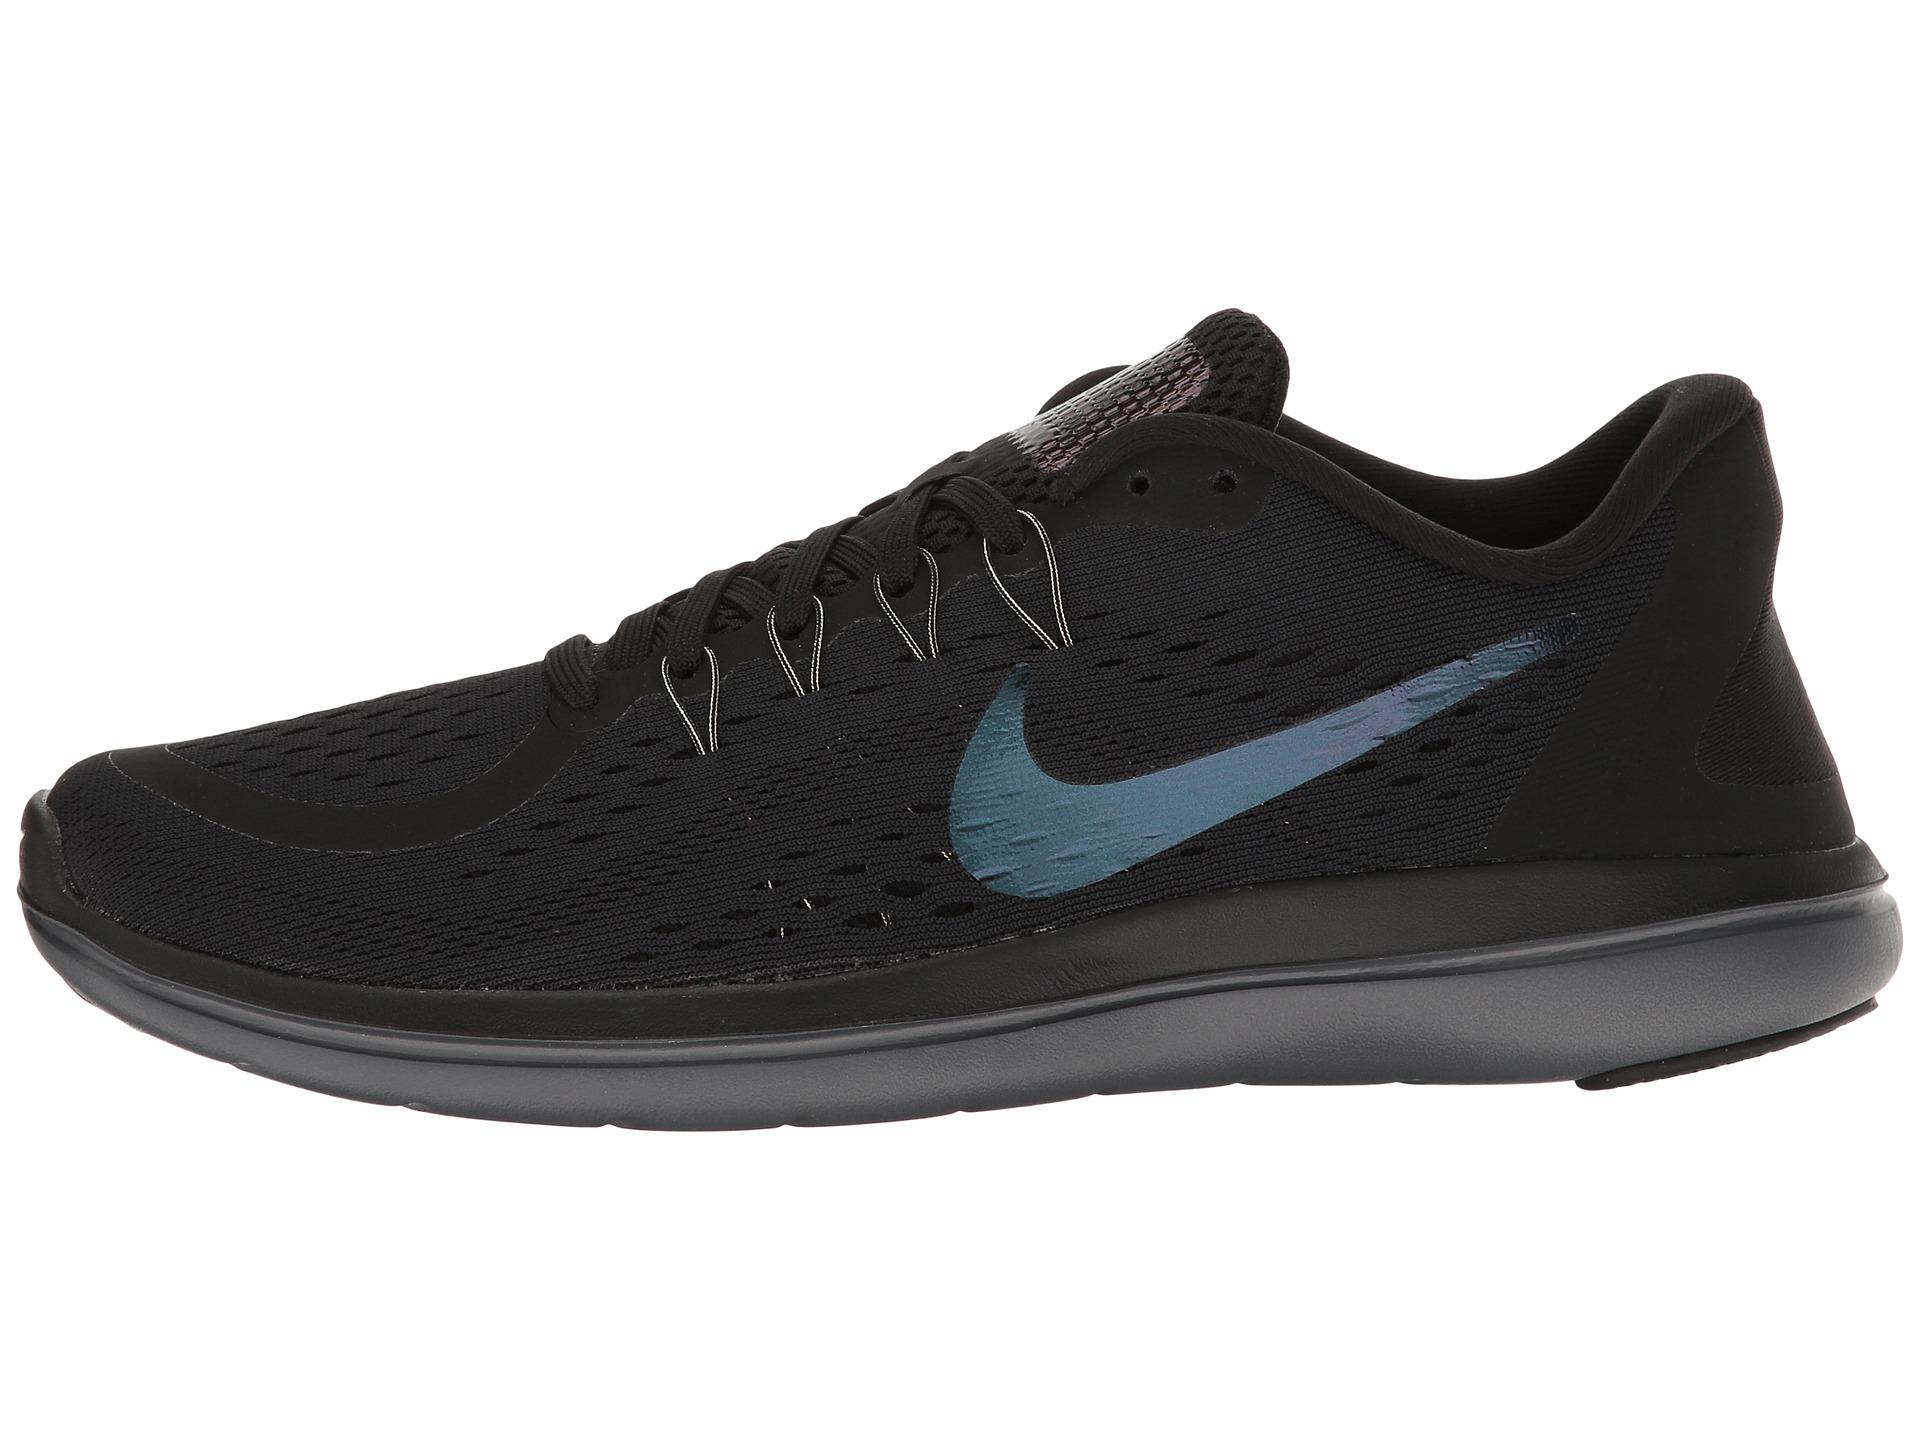 Bts Nike Shoes